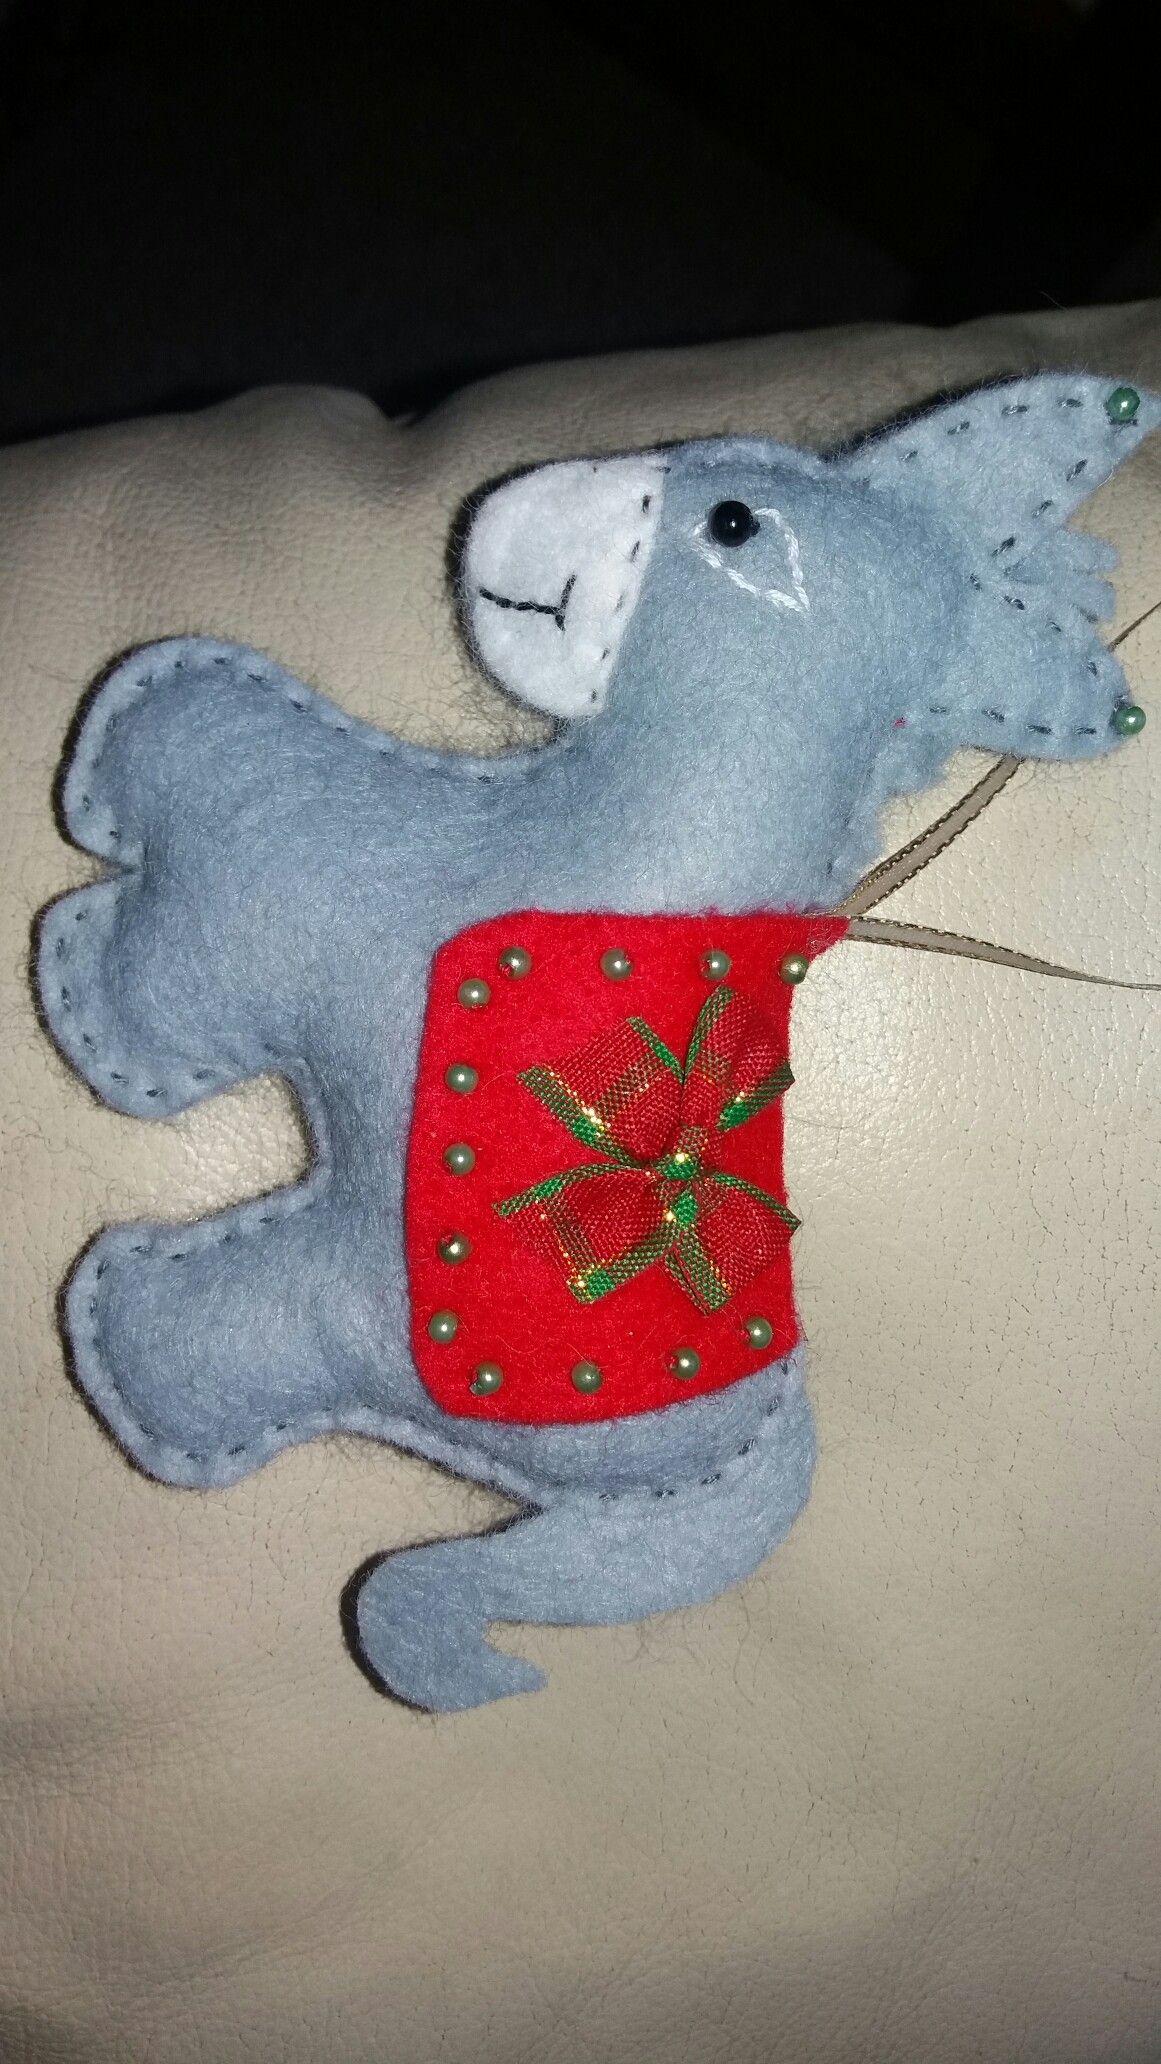 Donkey Christmas Ornaments.Felt Donkey Christmas Ornament Wool Felt Ornaments